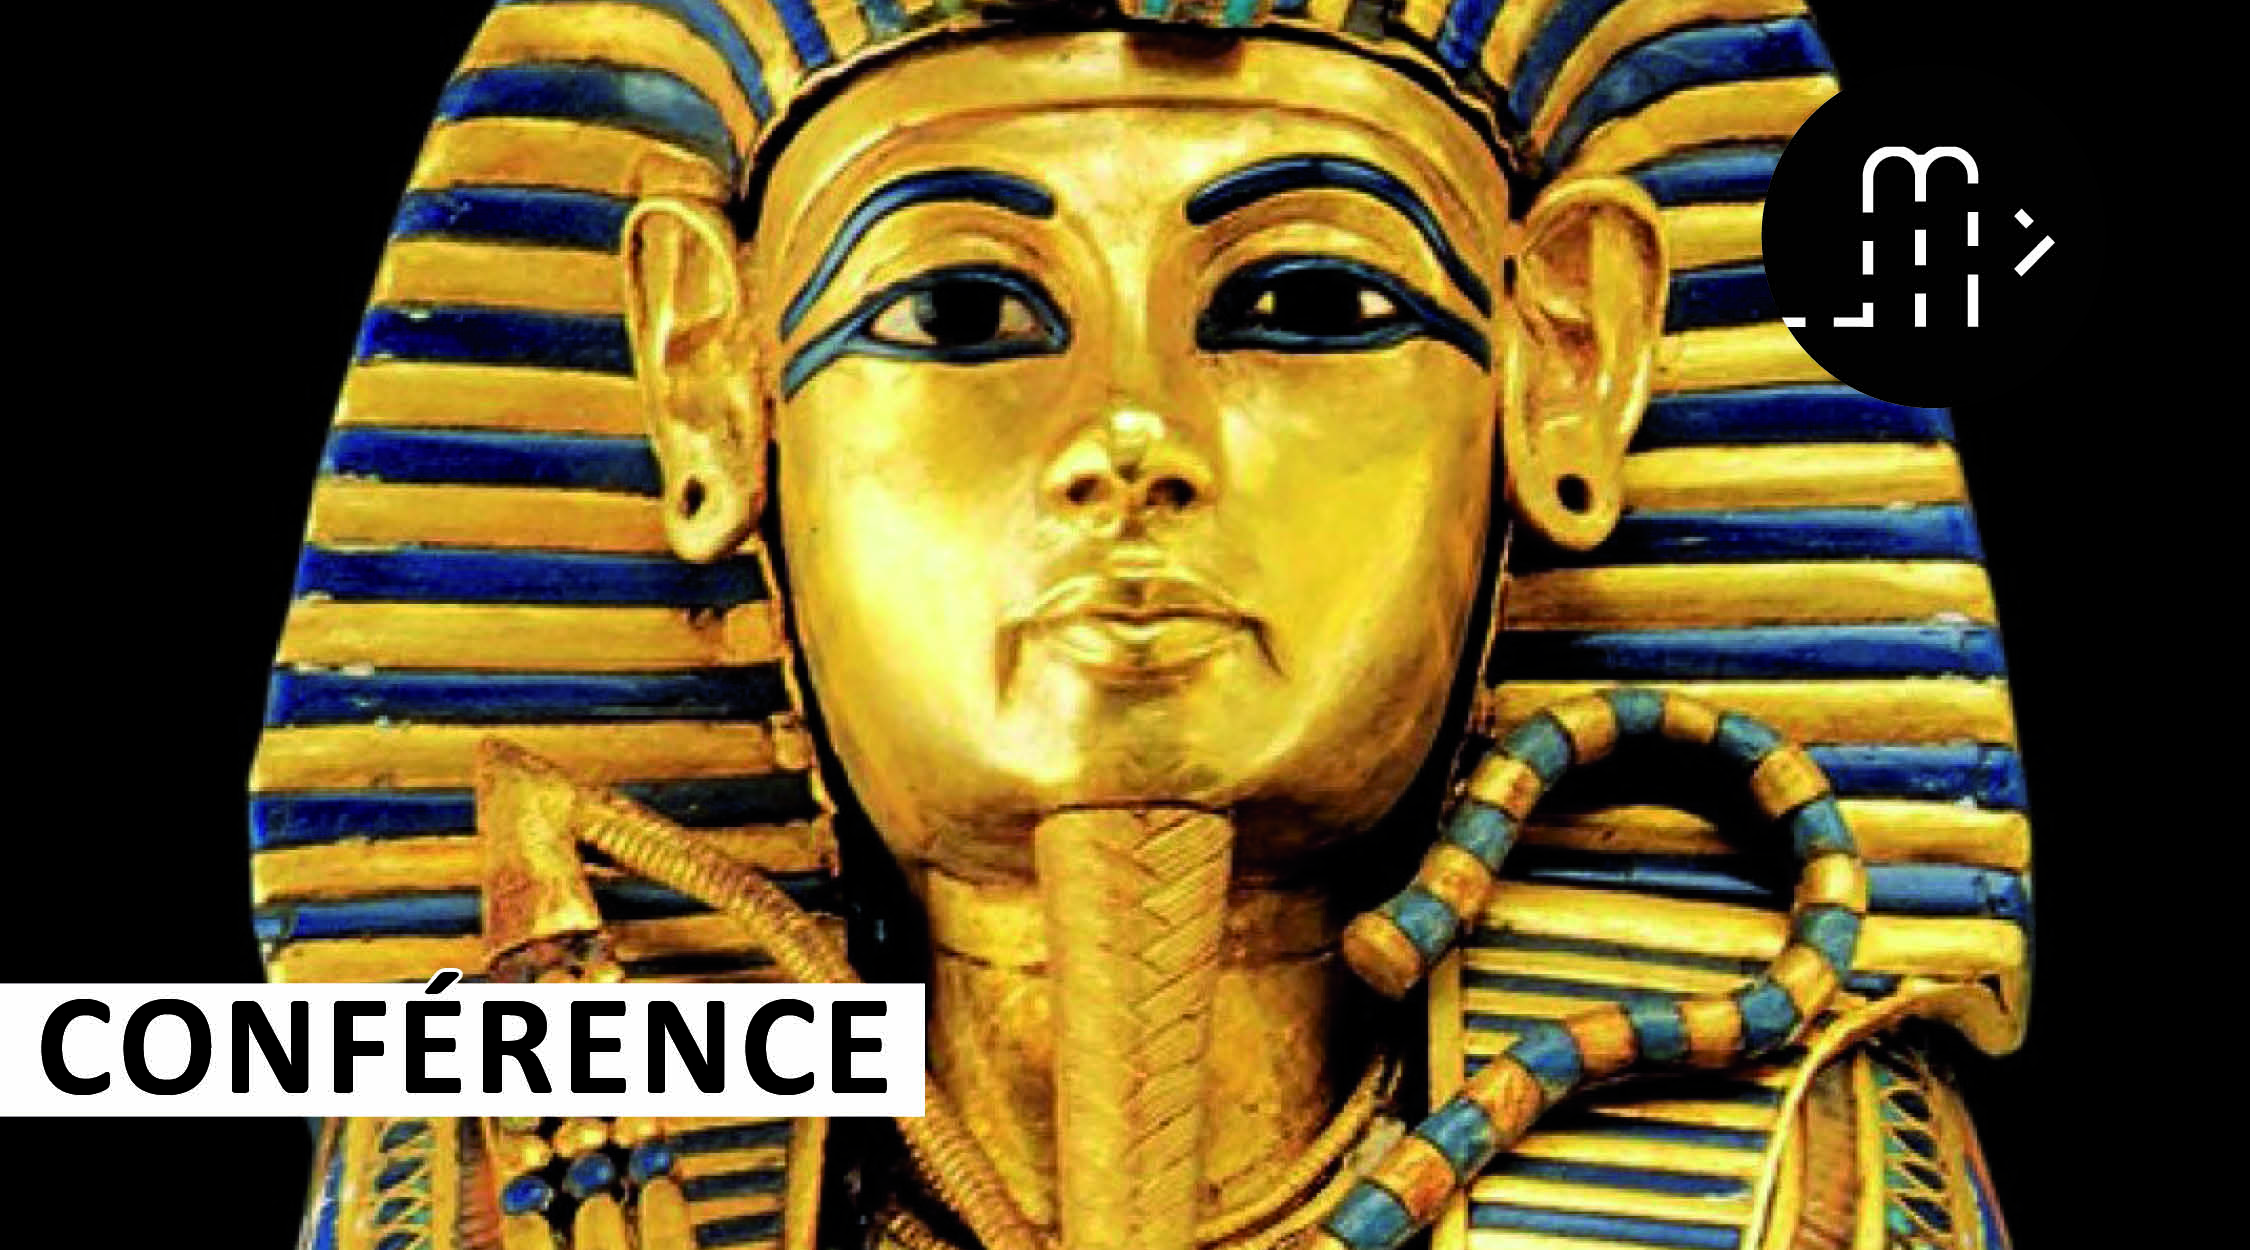 Conférence : Toutânkhamon, le trésor du pharaon